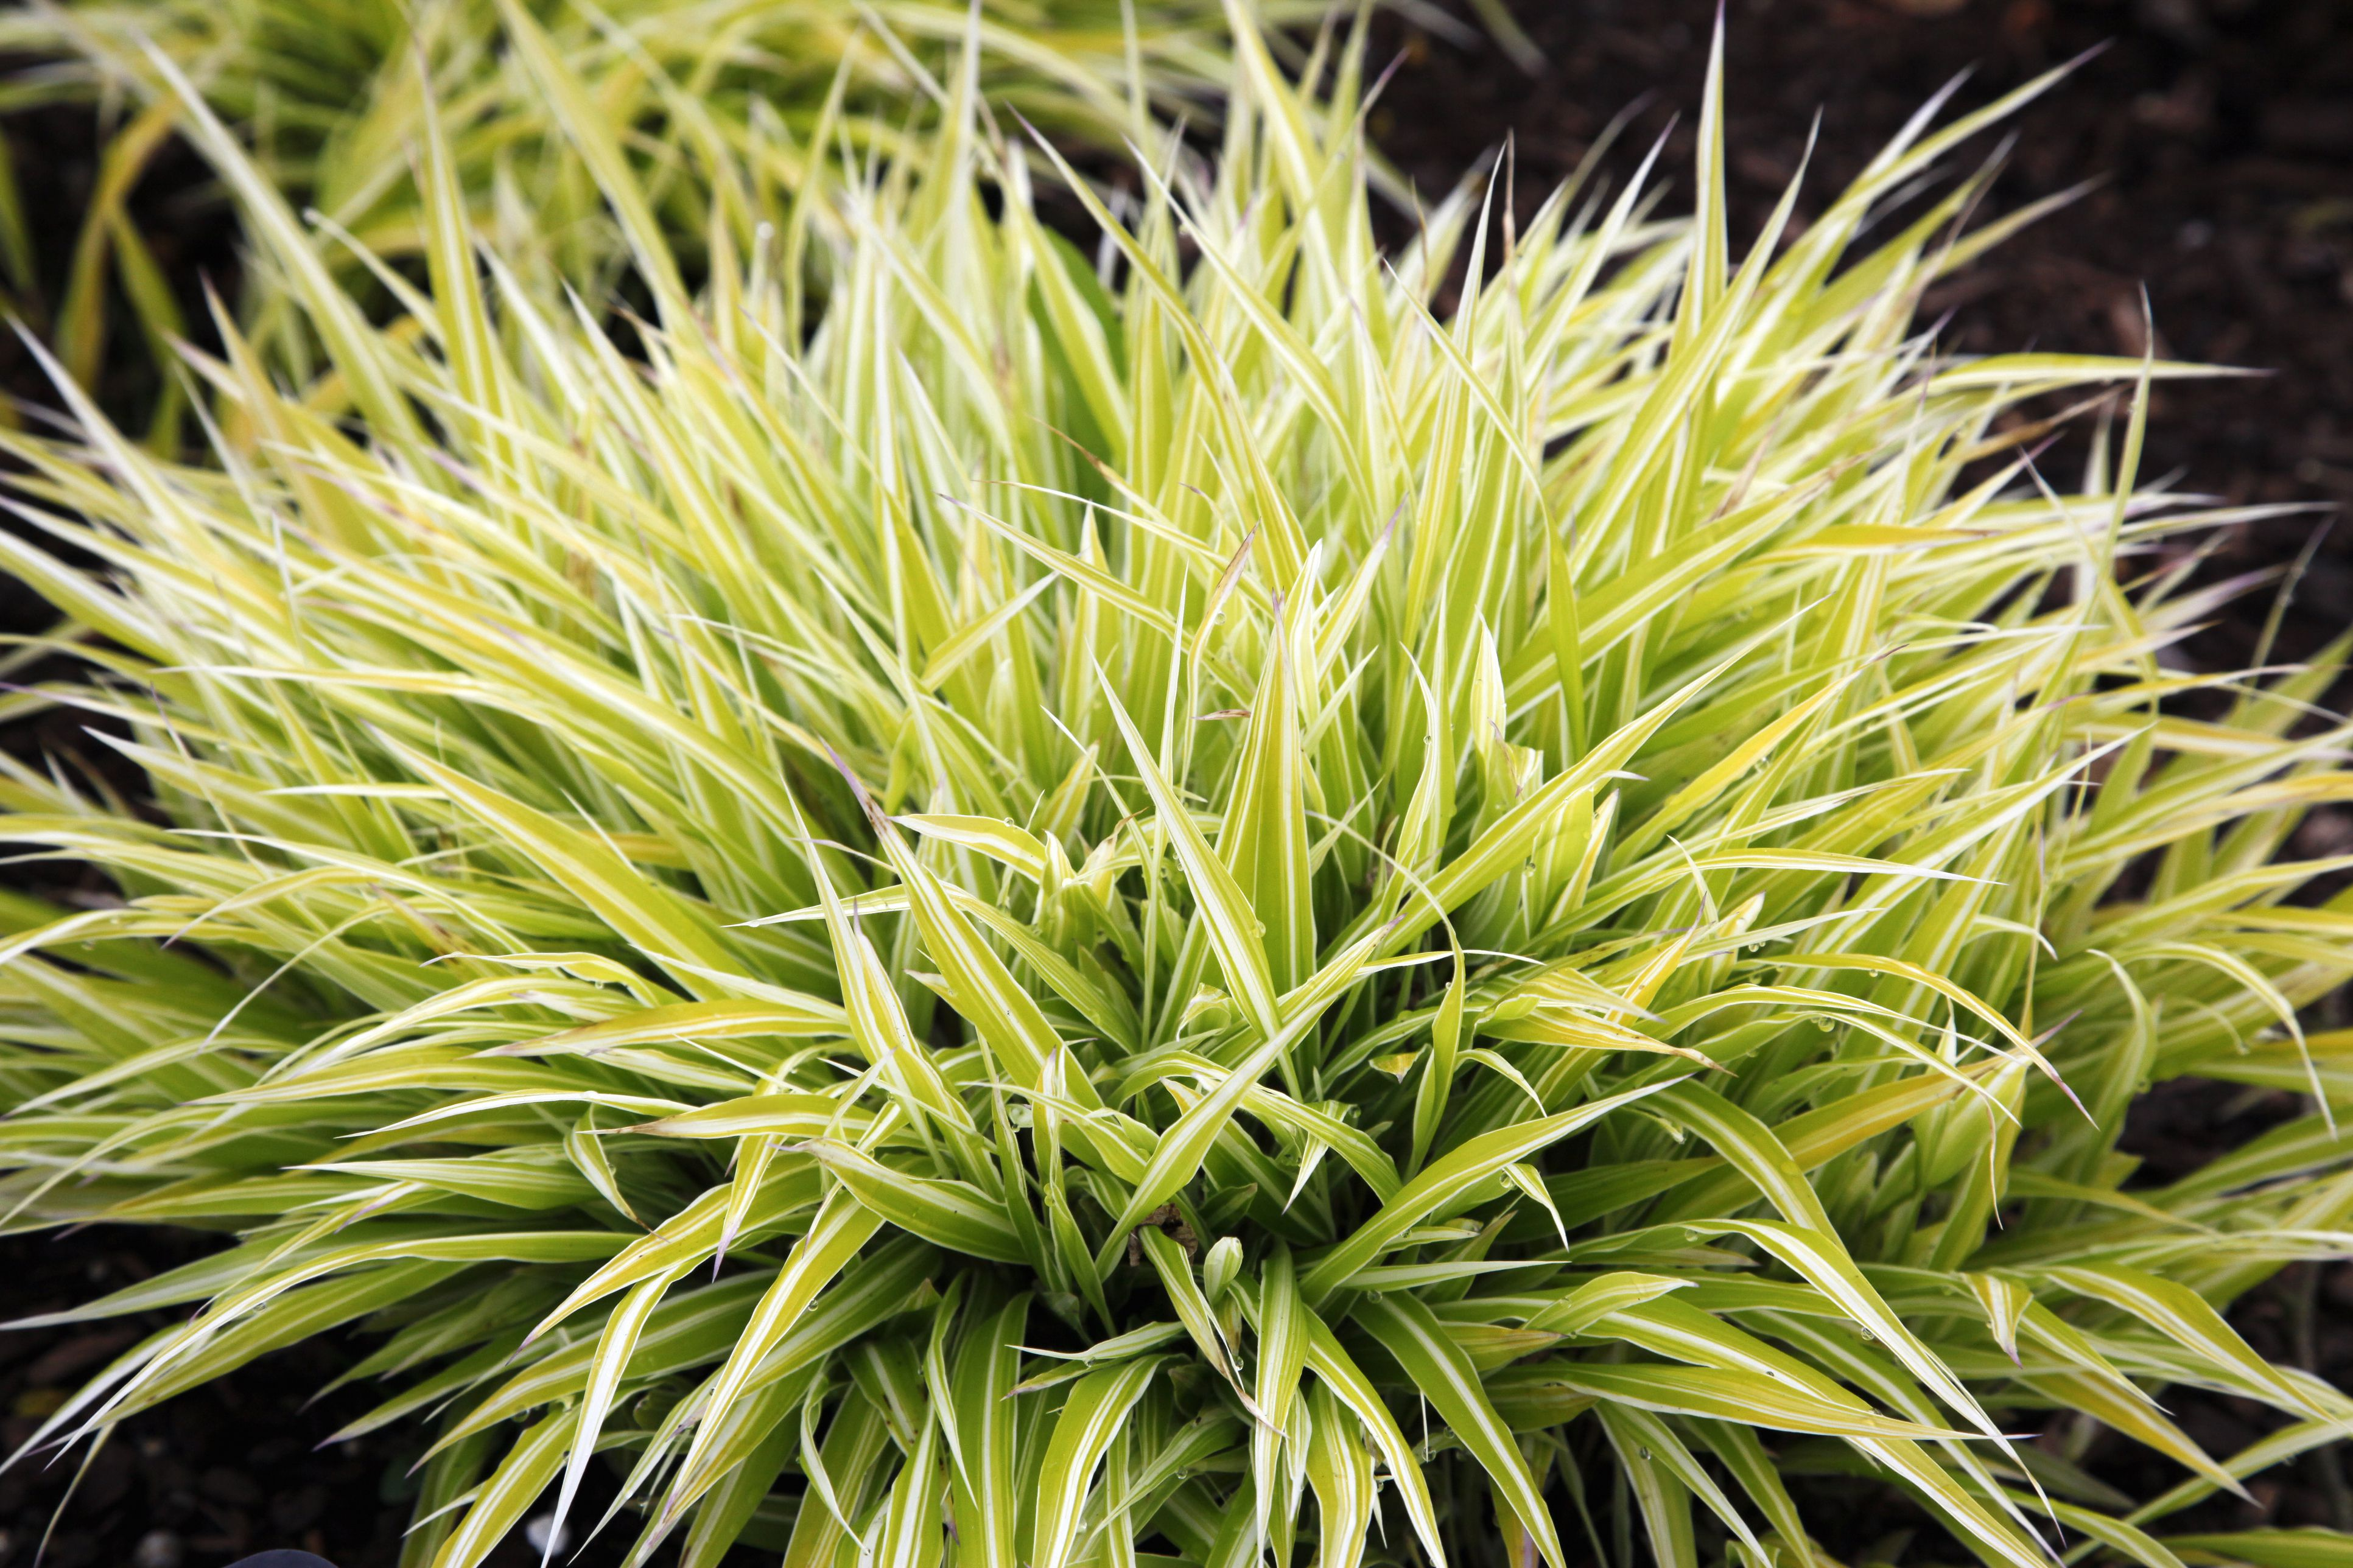 Close Up of Variegated Japanese Forest Grass (Hakonechloa macra)